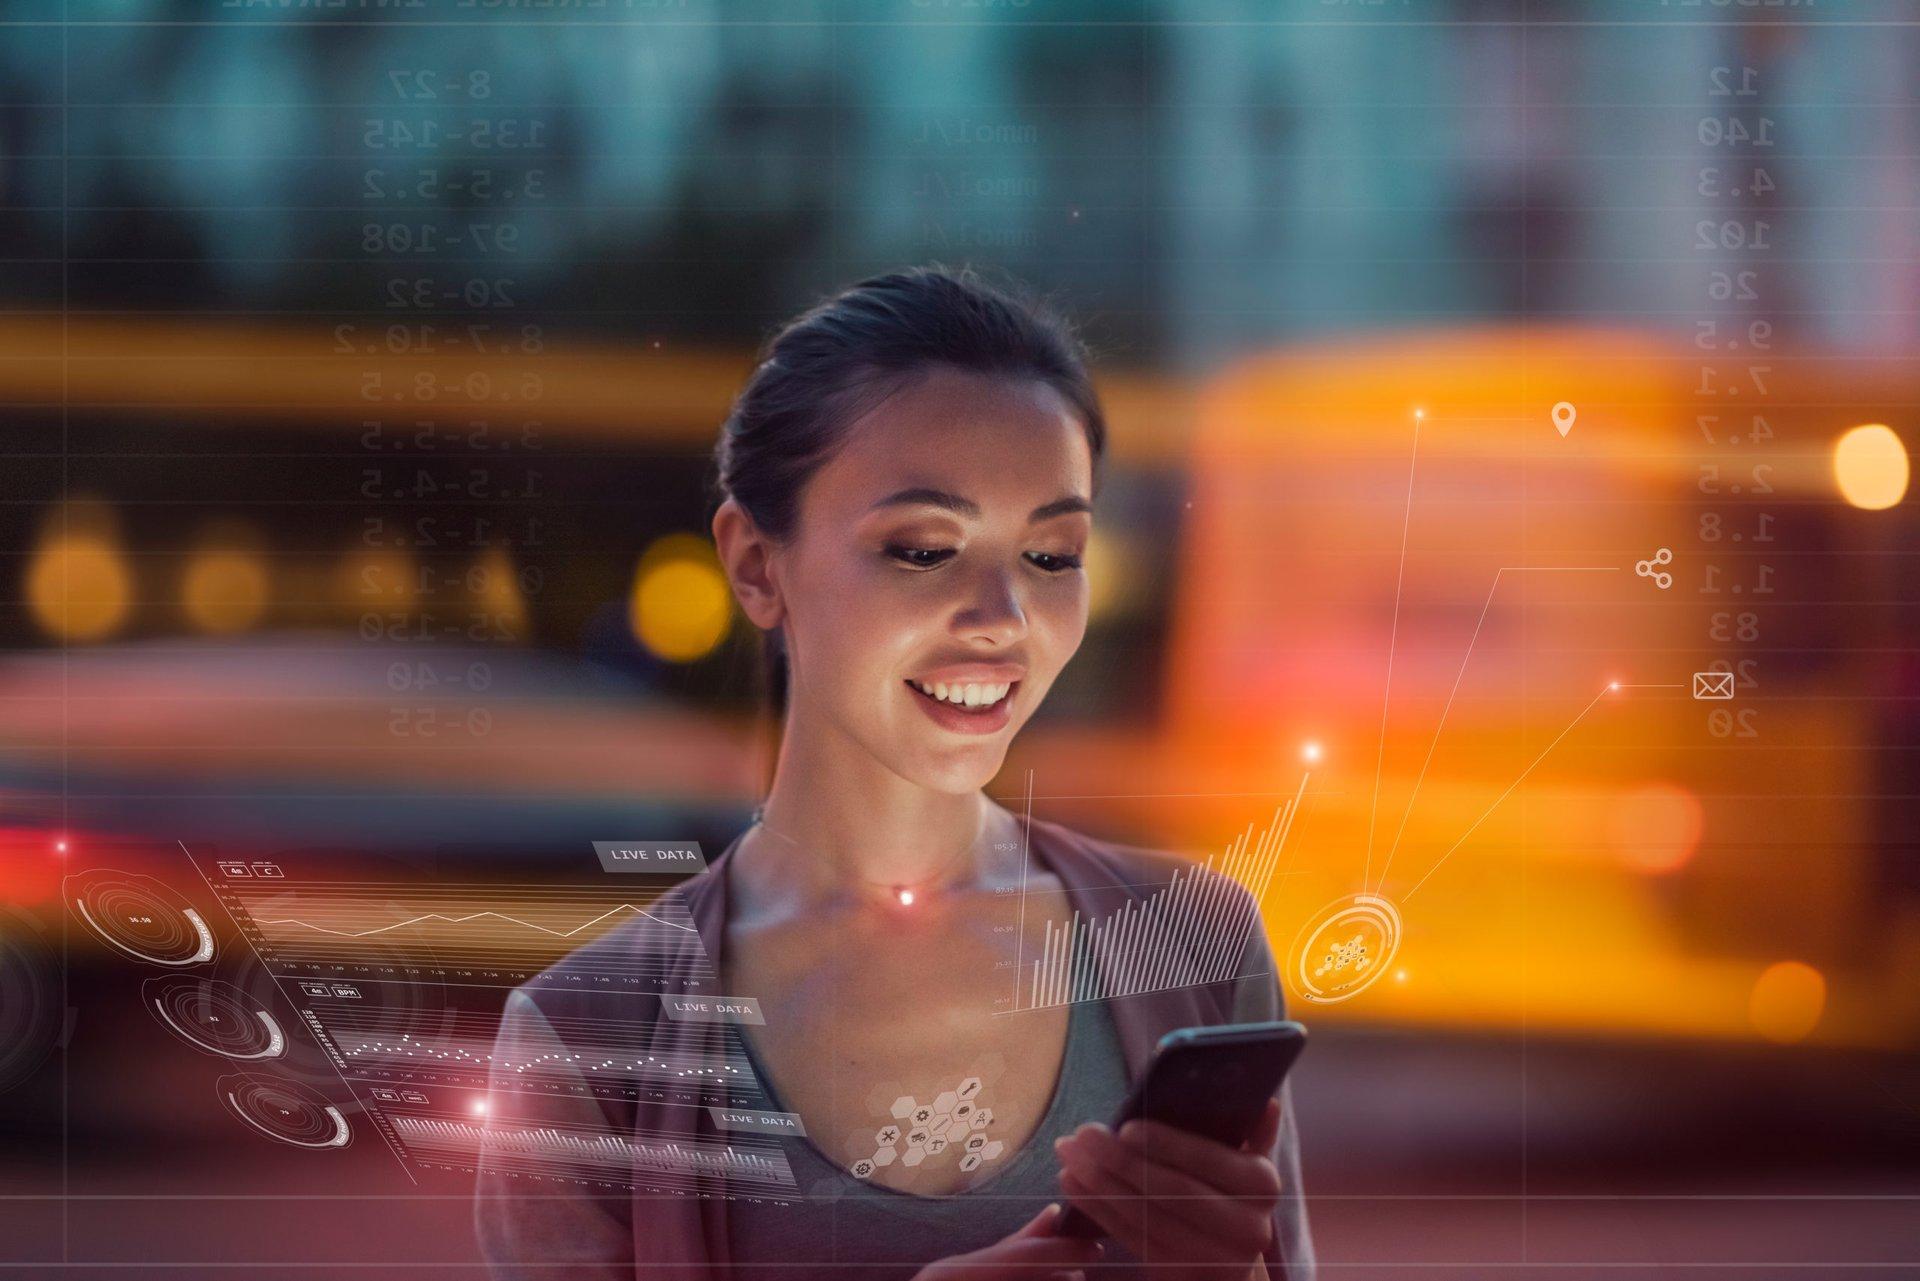 Woman using her smartphone data